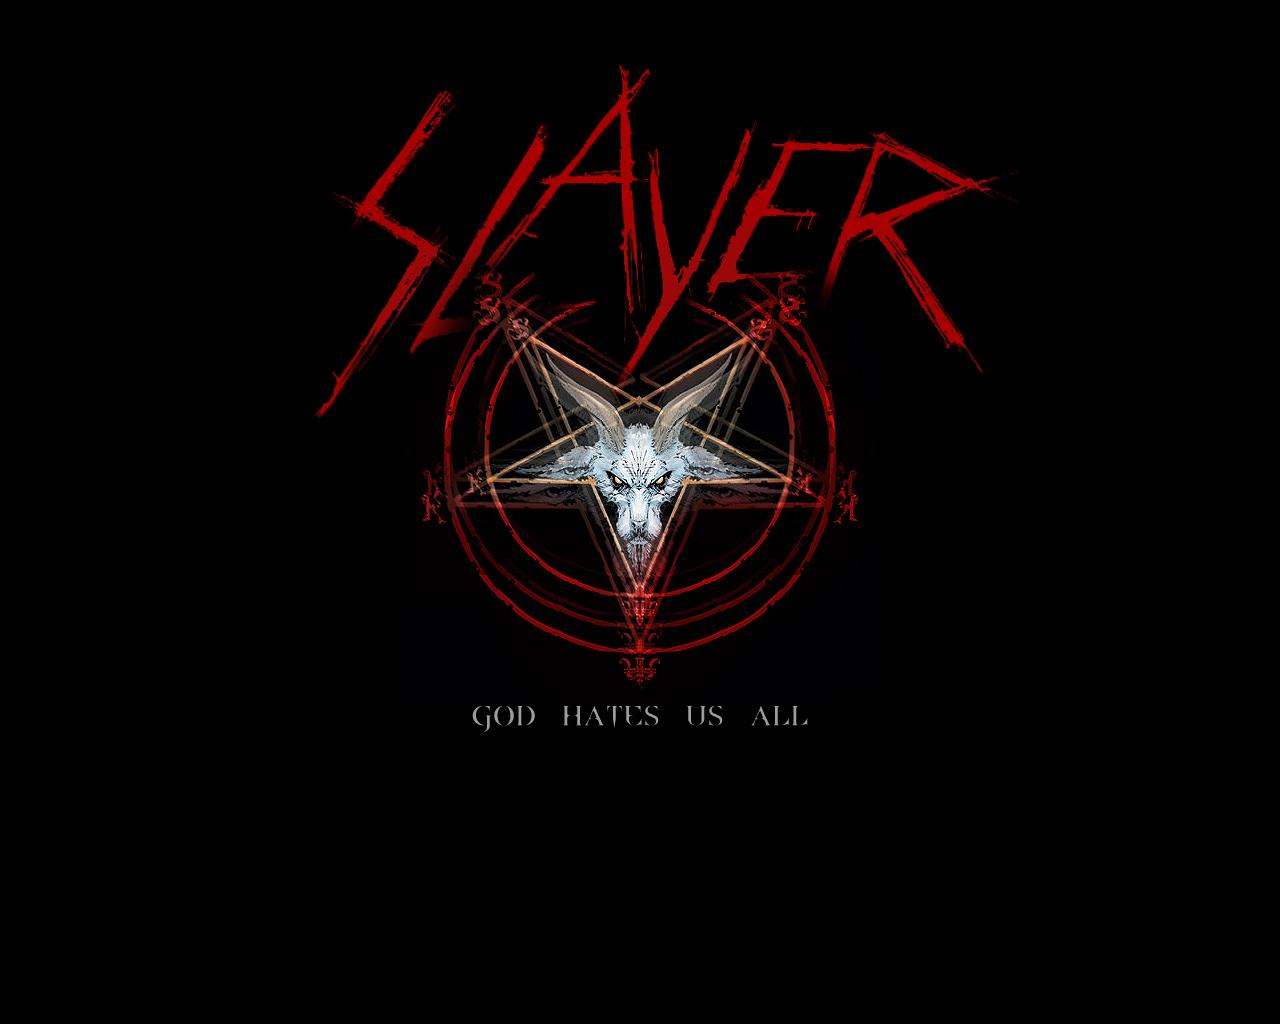 slayer Wallpaper Background 35195 1280x1024